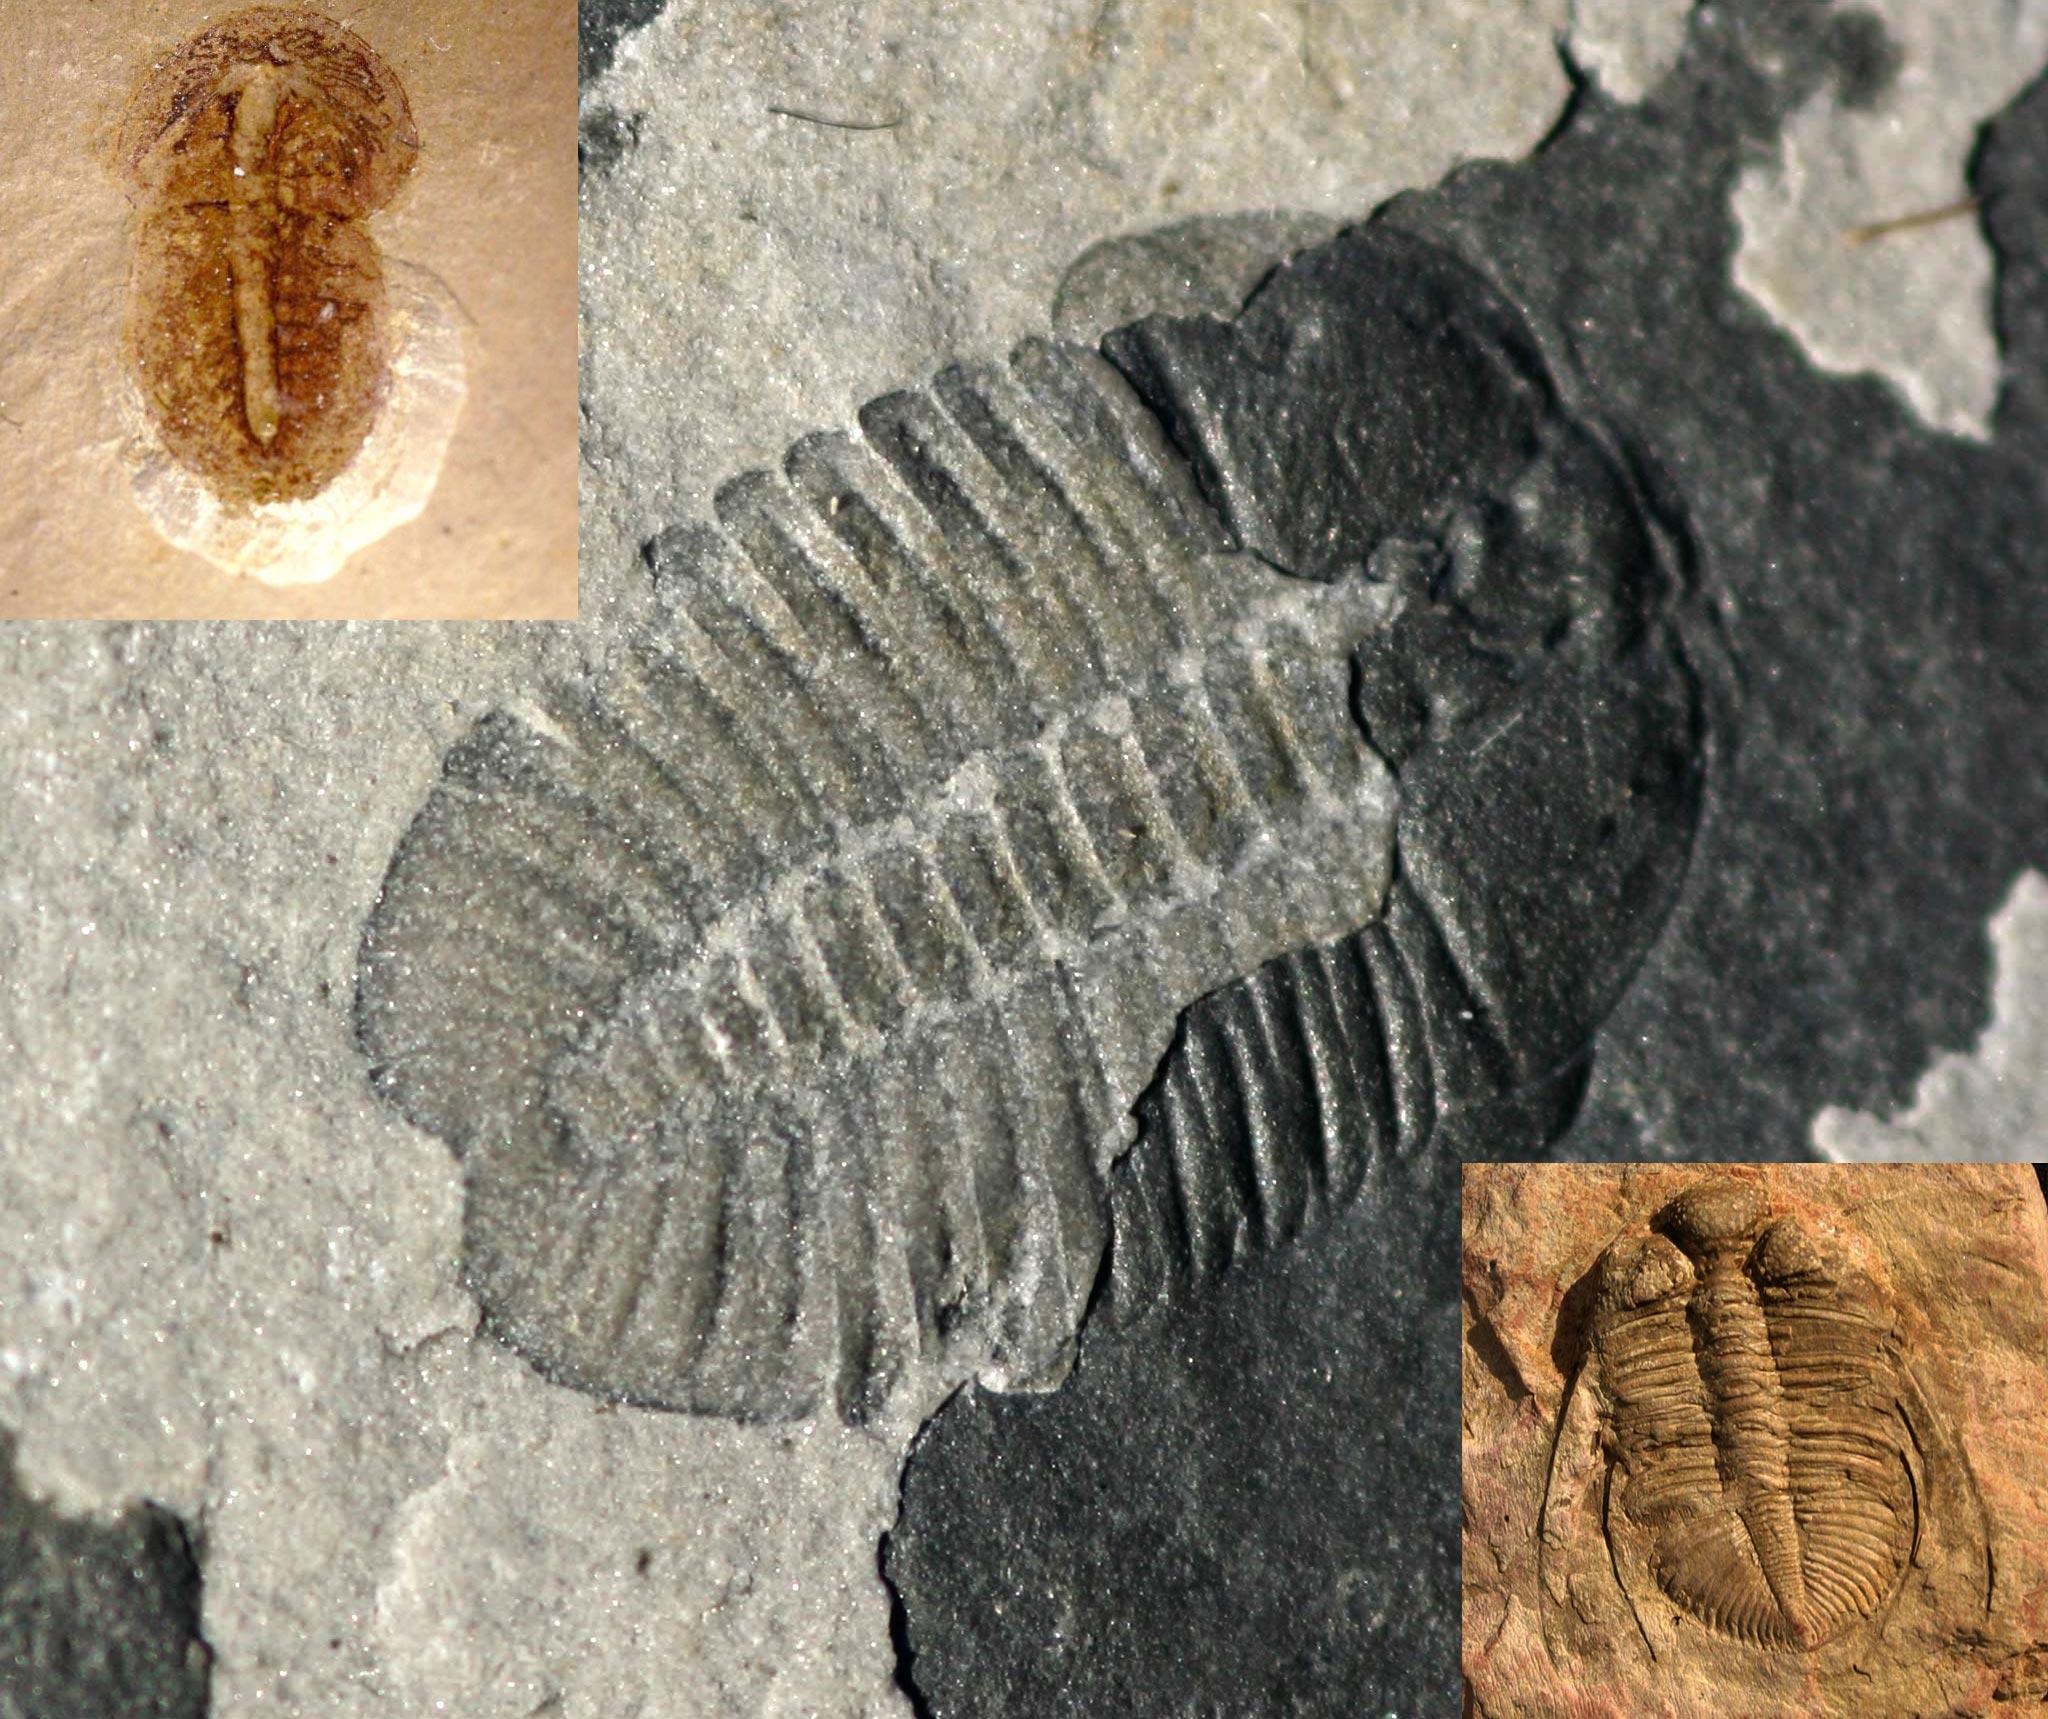 Chinese Trilobites